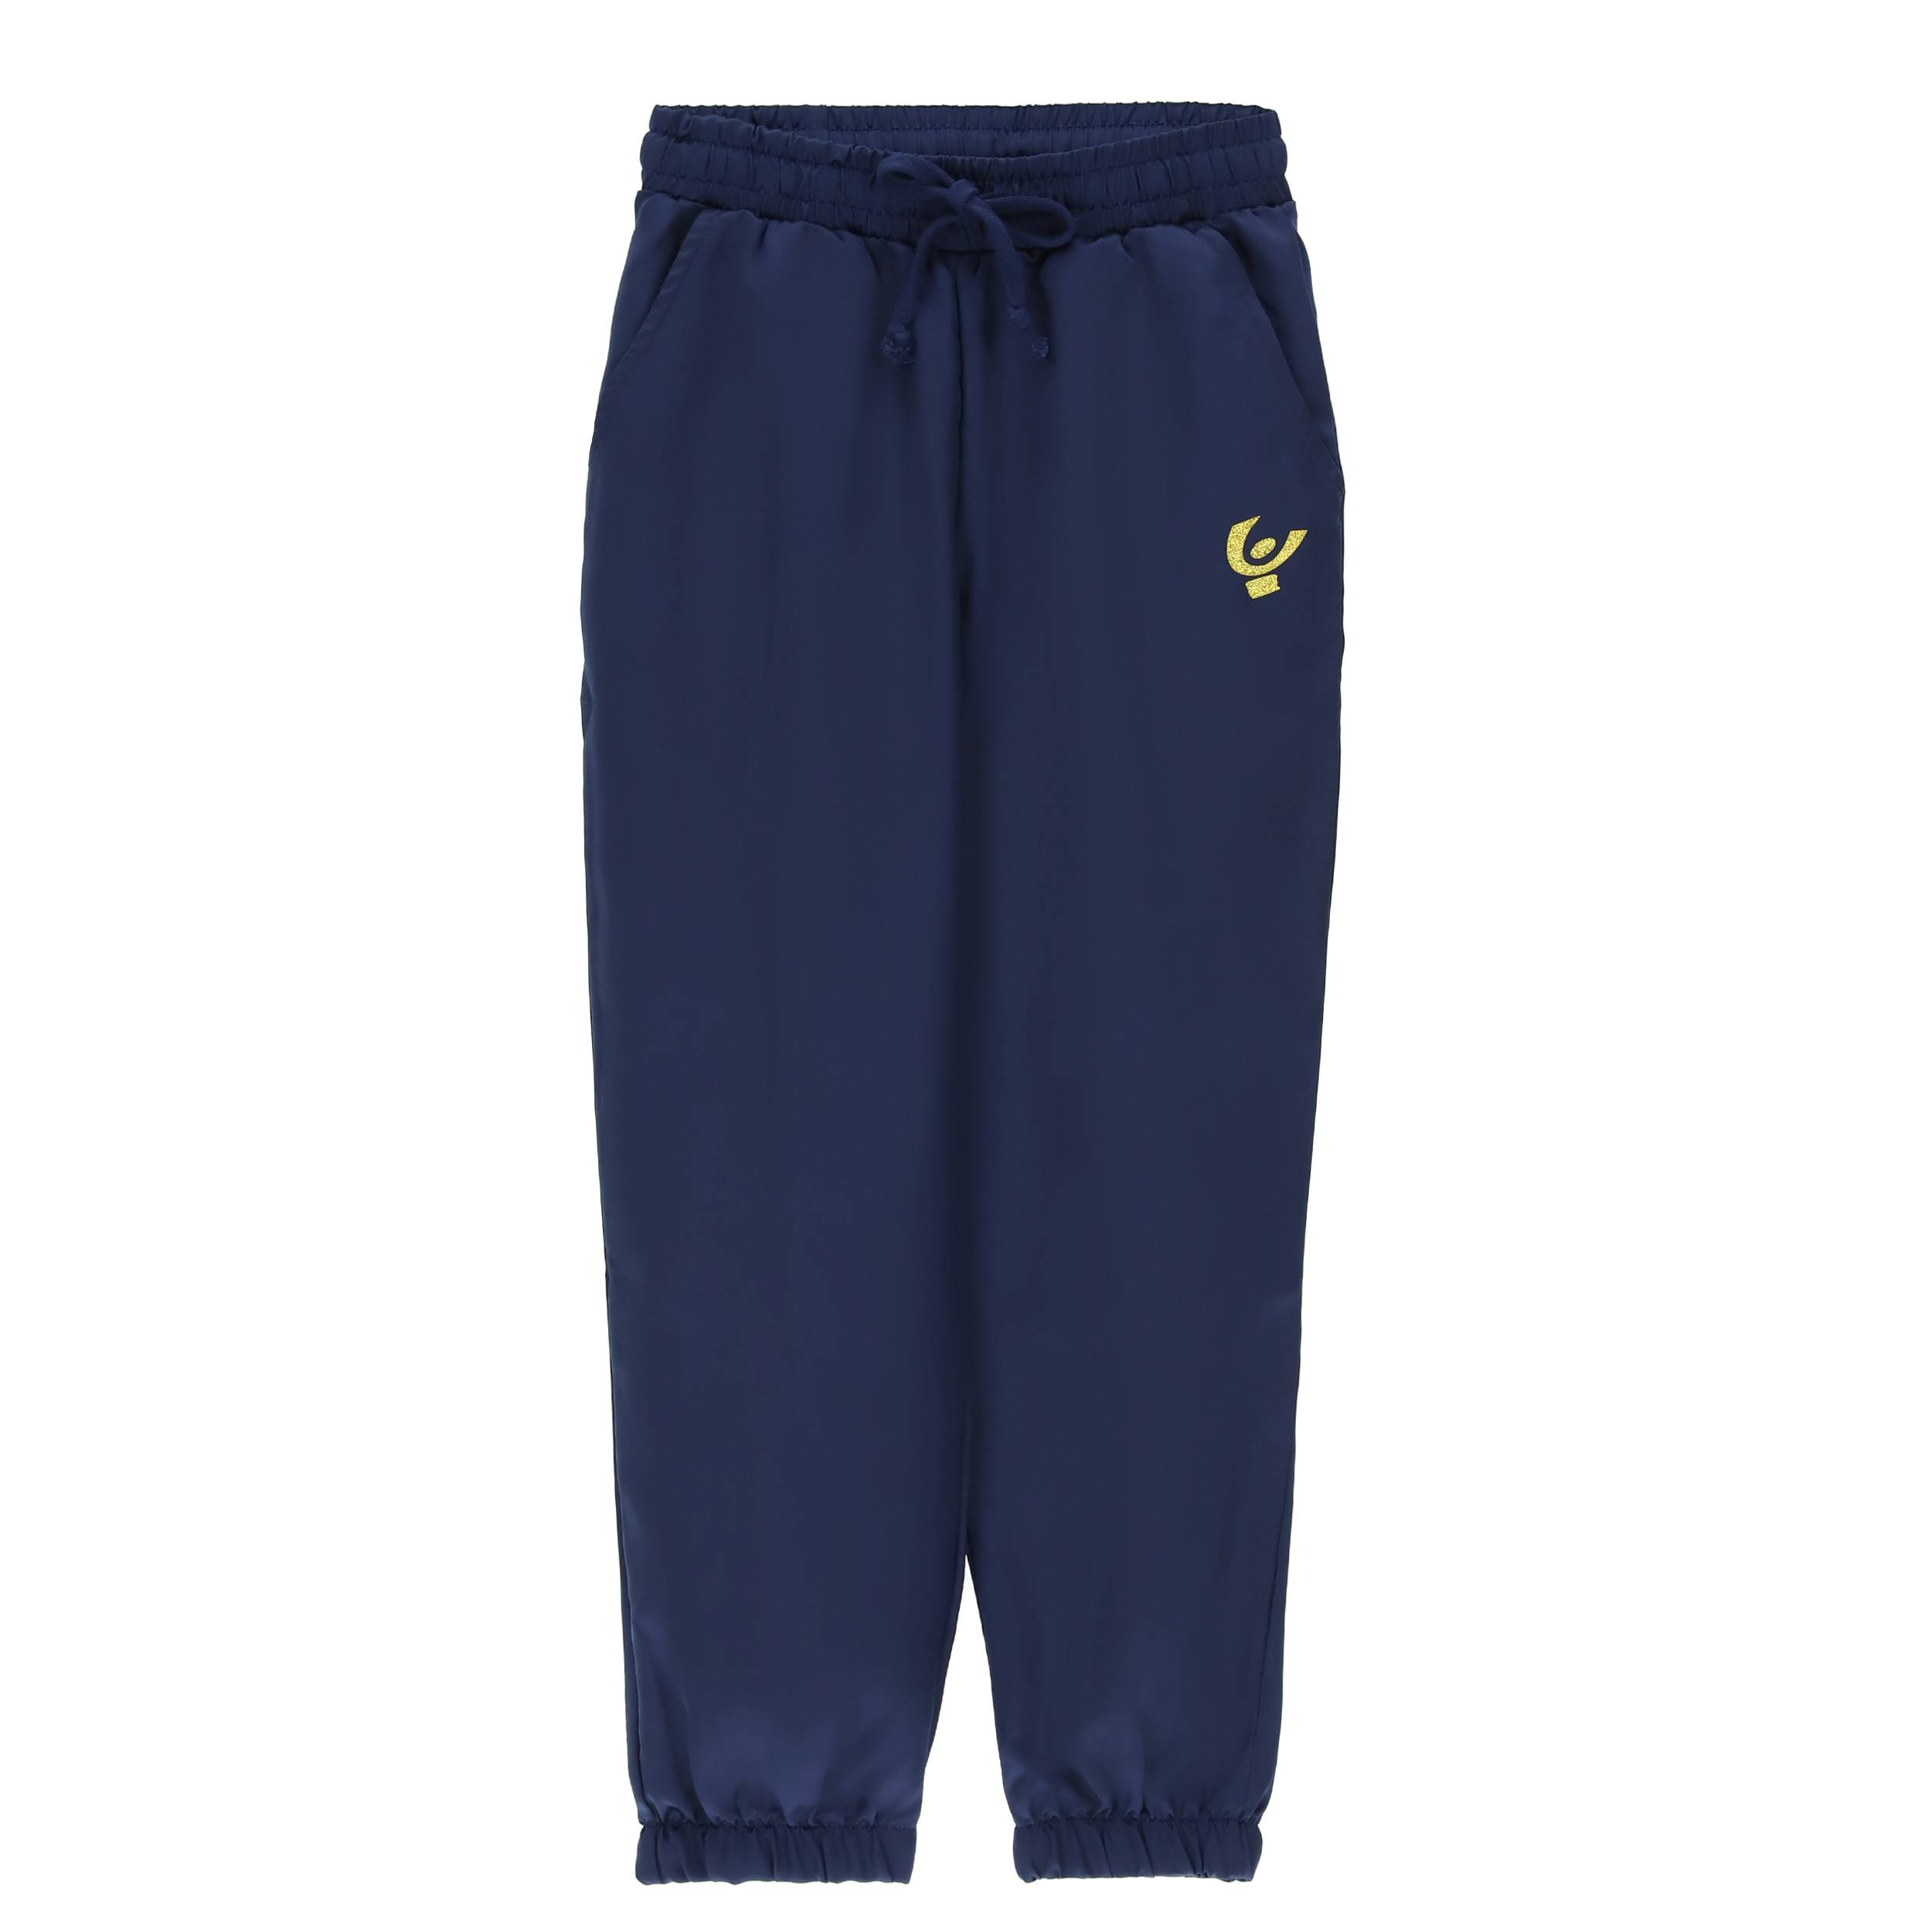 Freddy Pantalone sportivo stile hip pop - Bambina 6-8 anni Blue